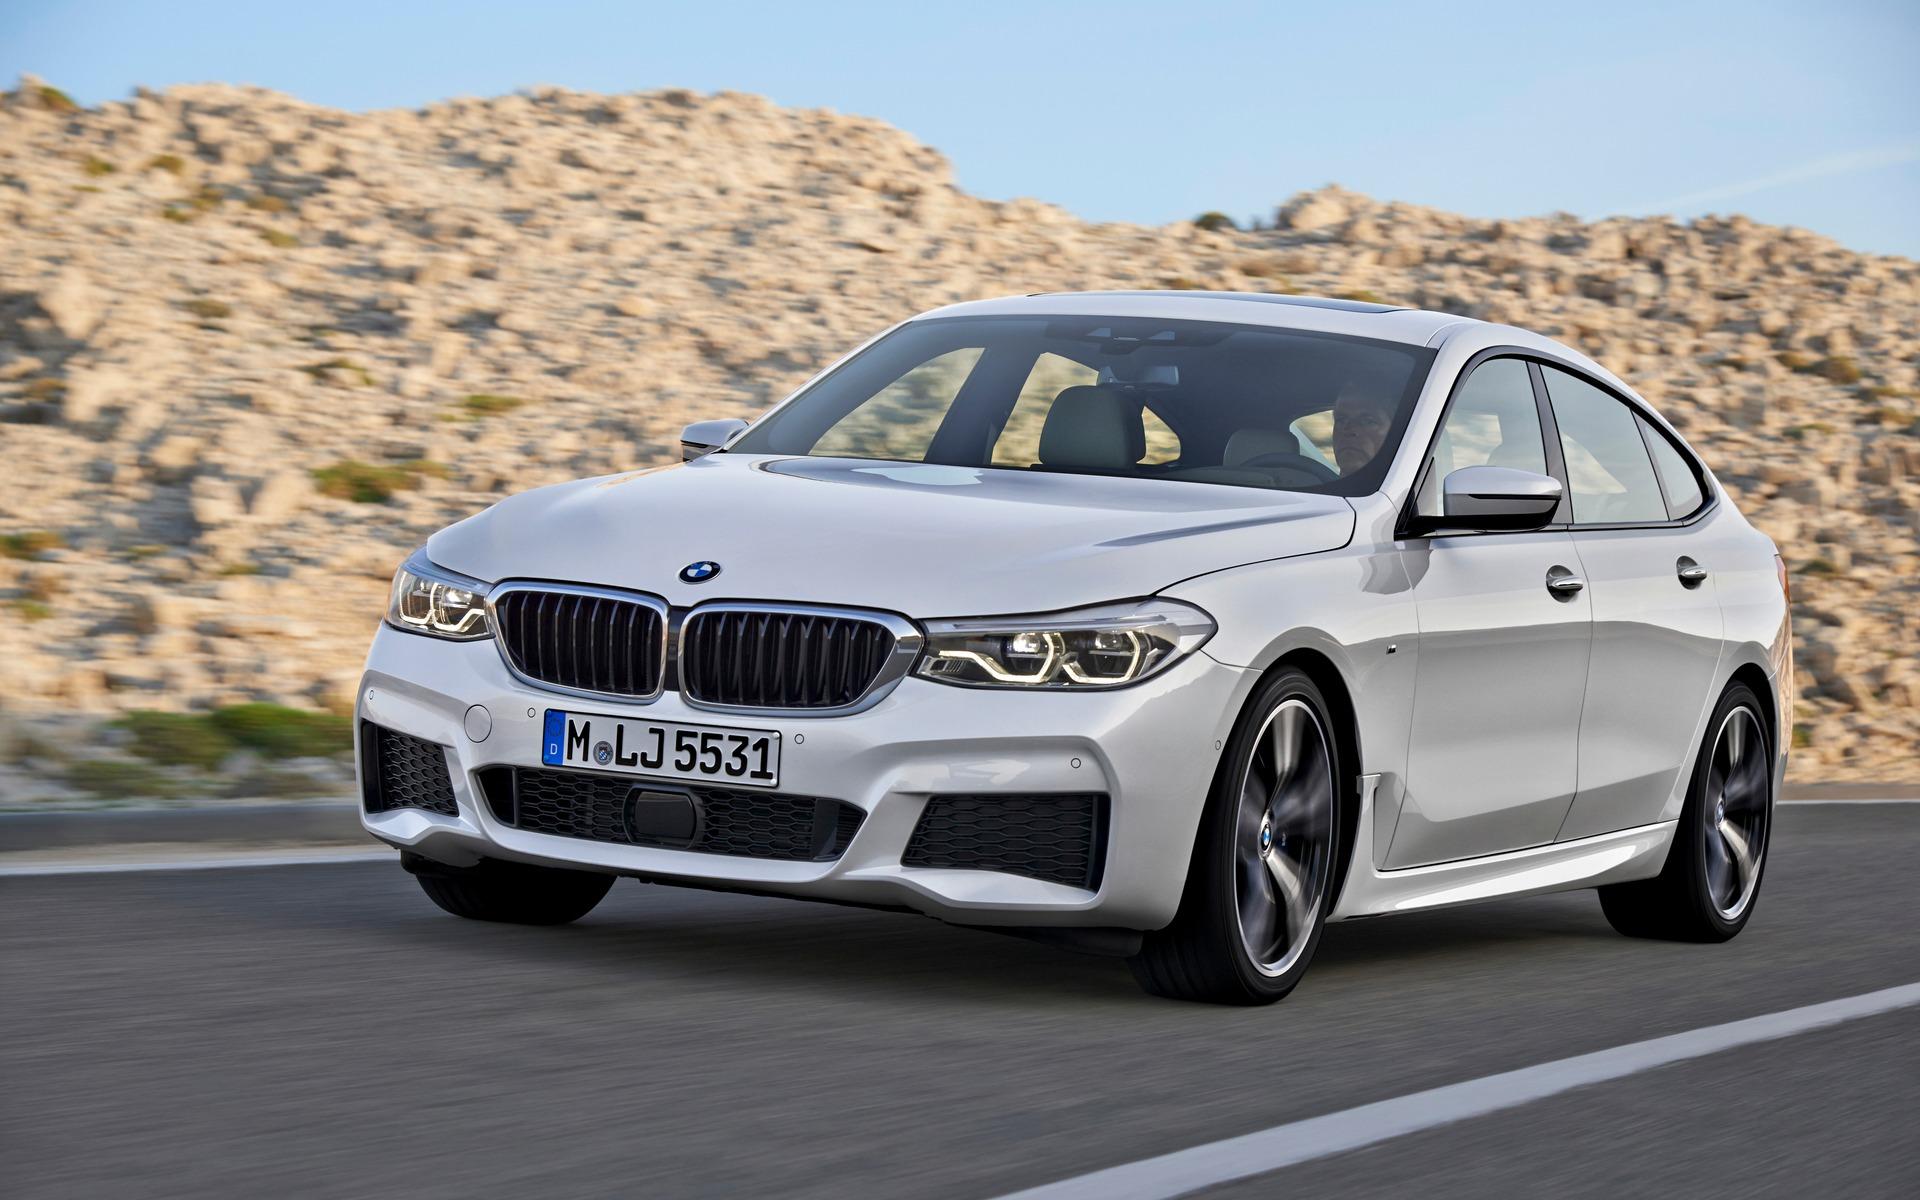 <p>BMW S&eacute;rie 6 Gran Turismo 2018</p>